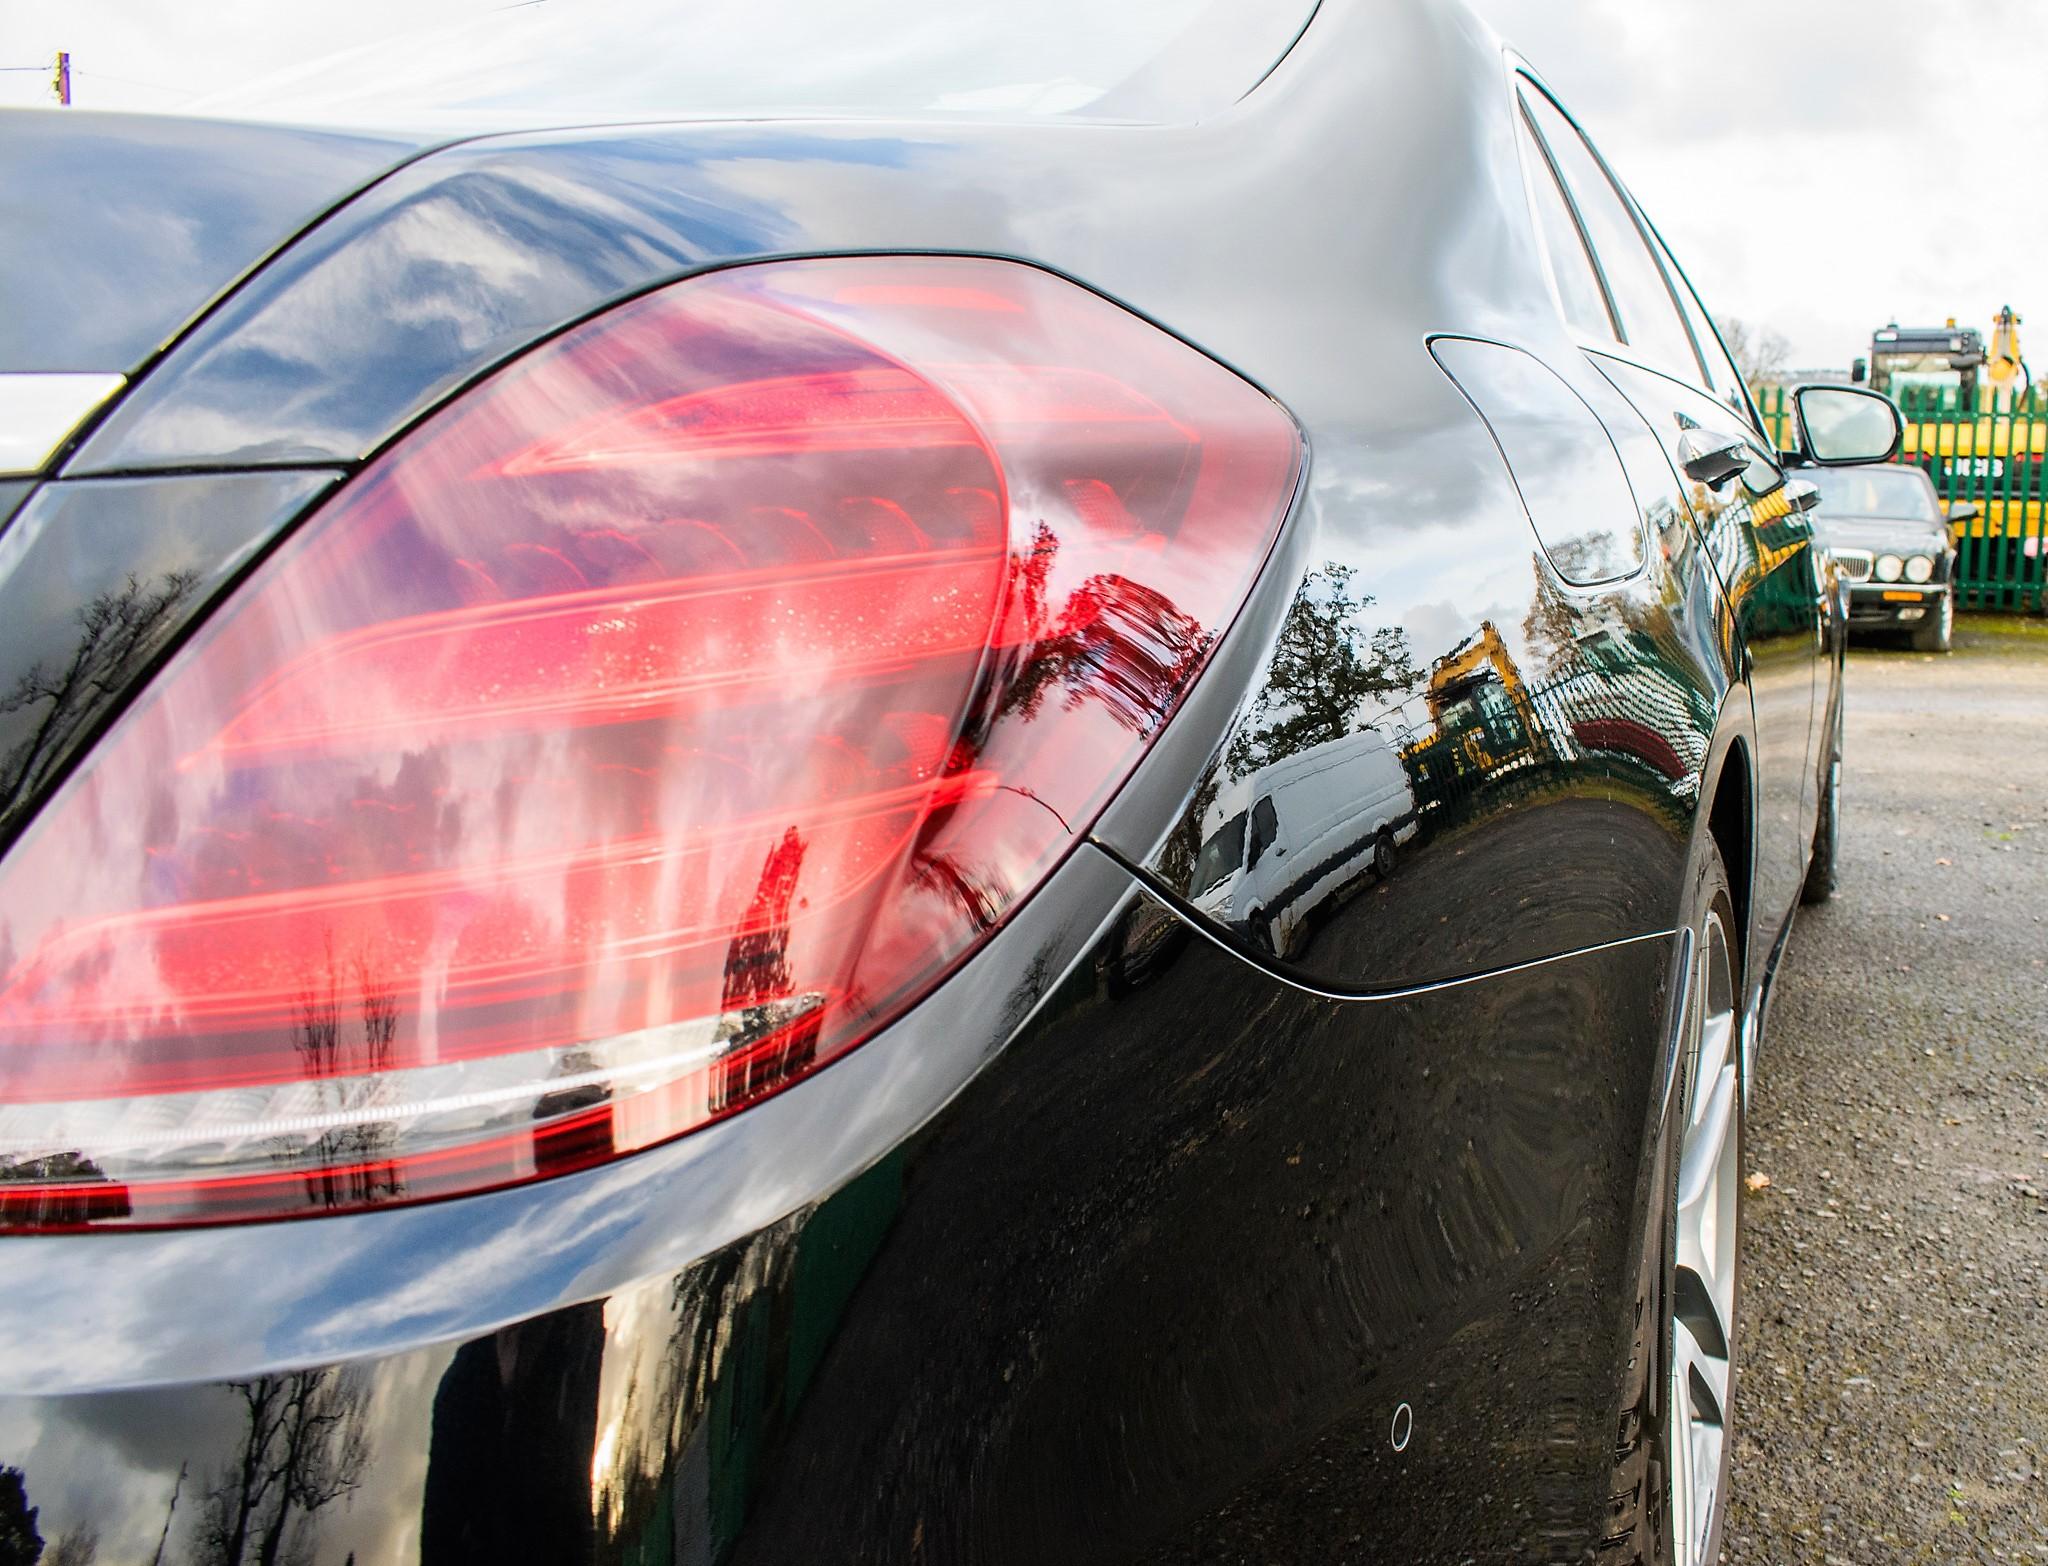 Mercedes Benz S450 L AMG Line Executive auto petrol 4 door saloon car Registration Number: FX68 - Image 10 of 33